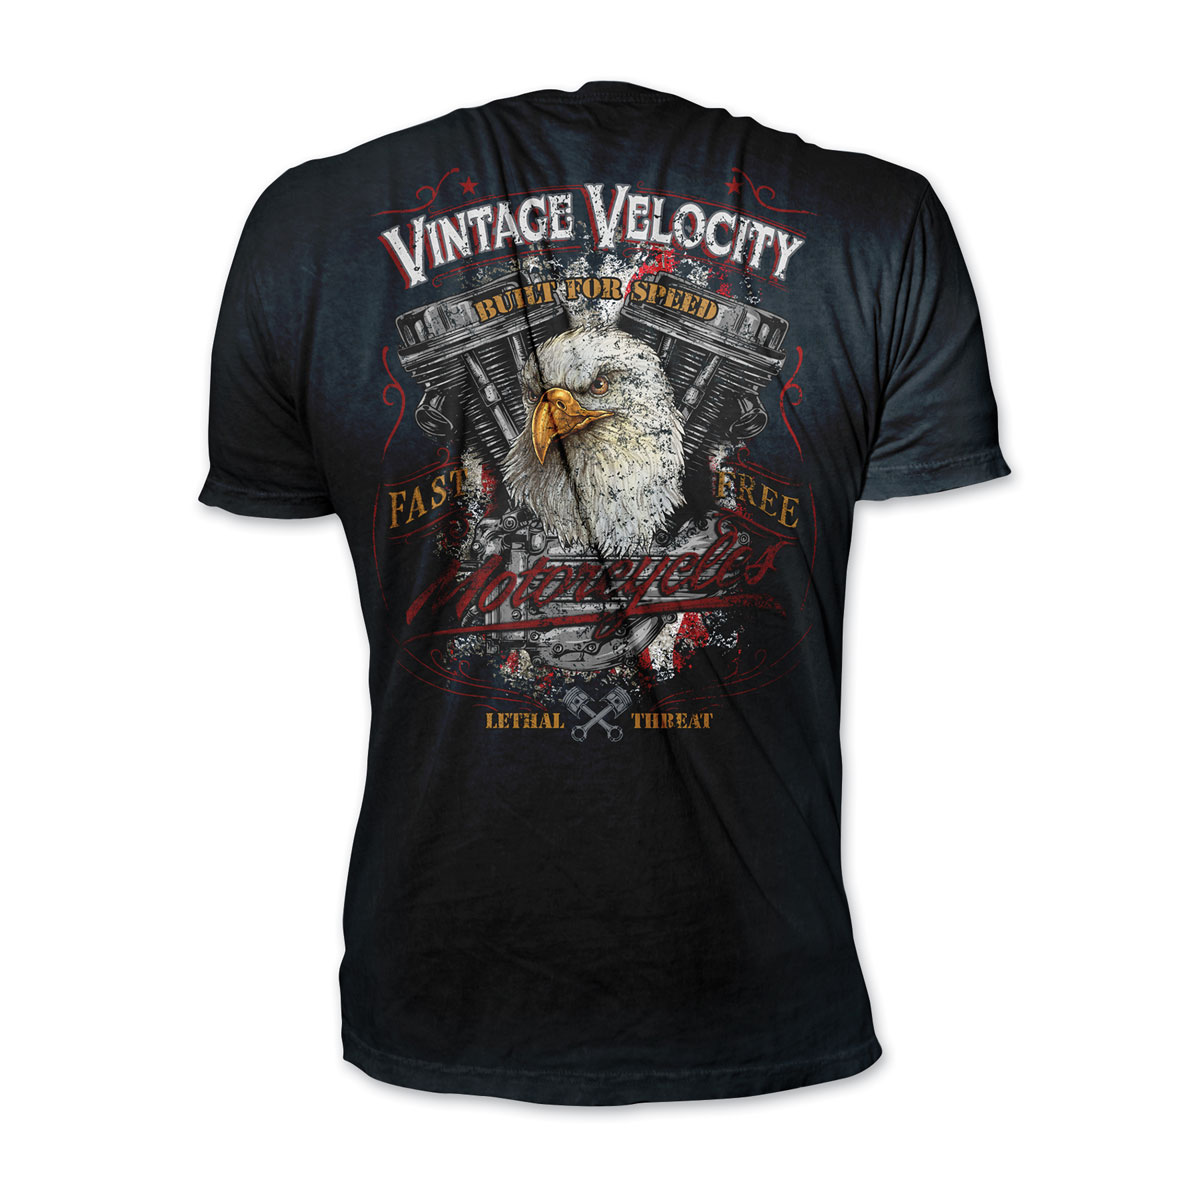 Lethal Threat Men's Eagle Motorcycle Black T-Shirt